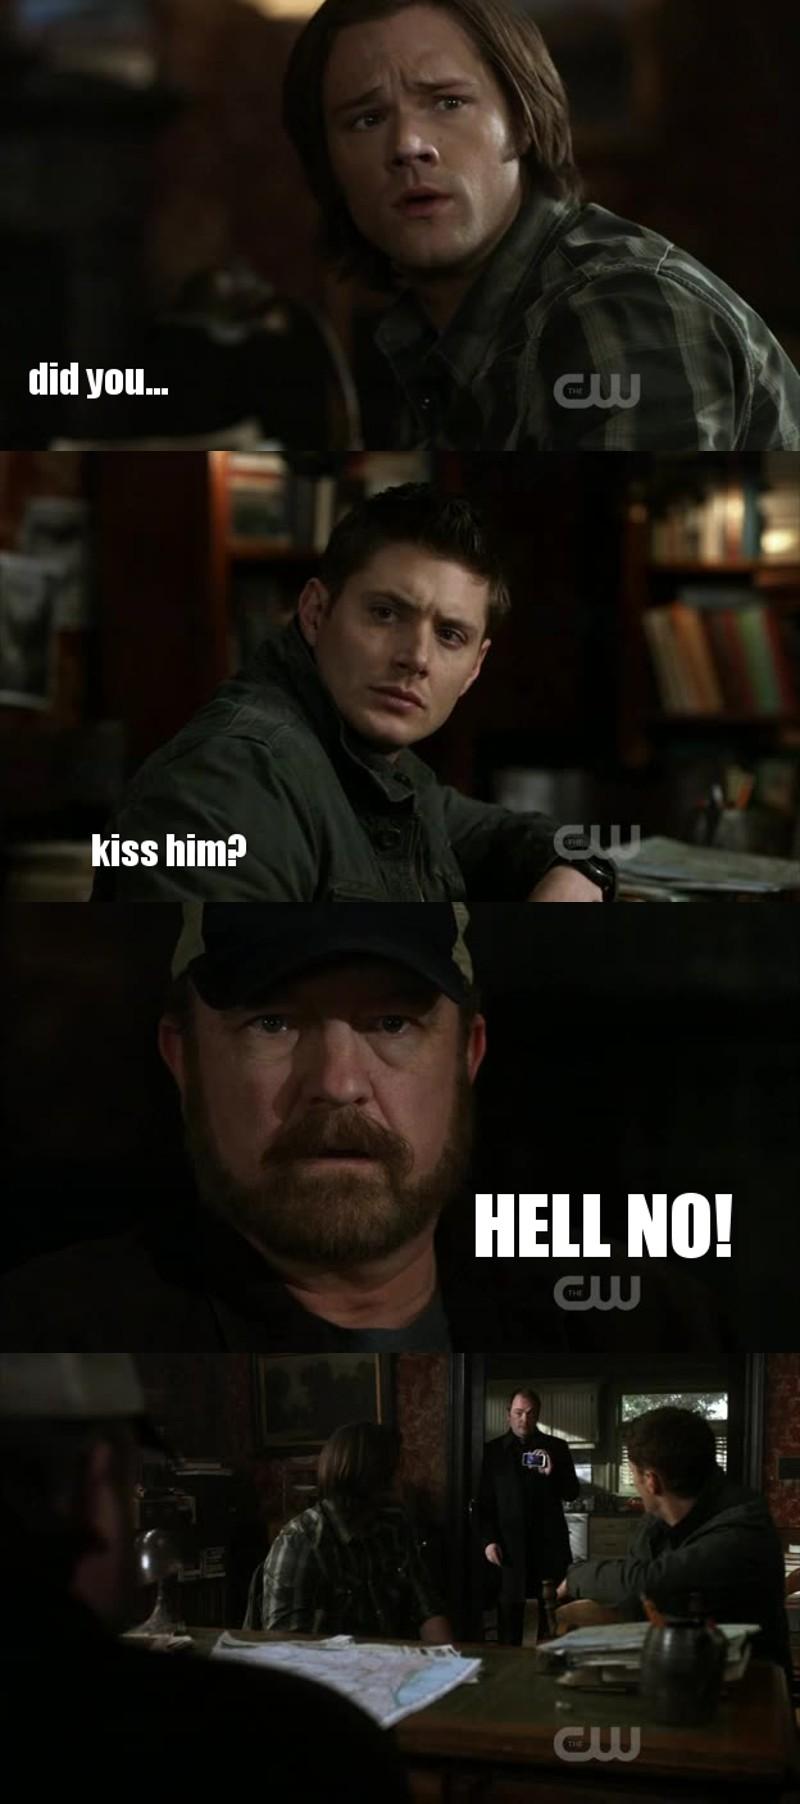 hahaha 😂